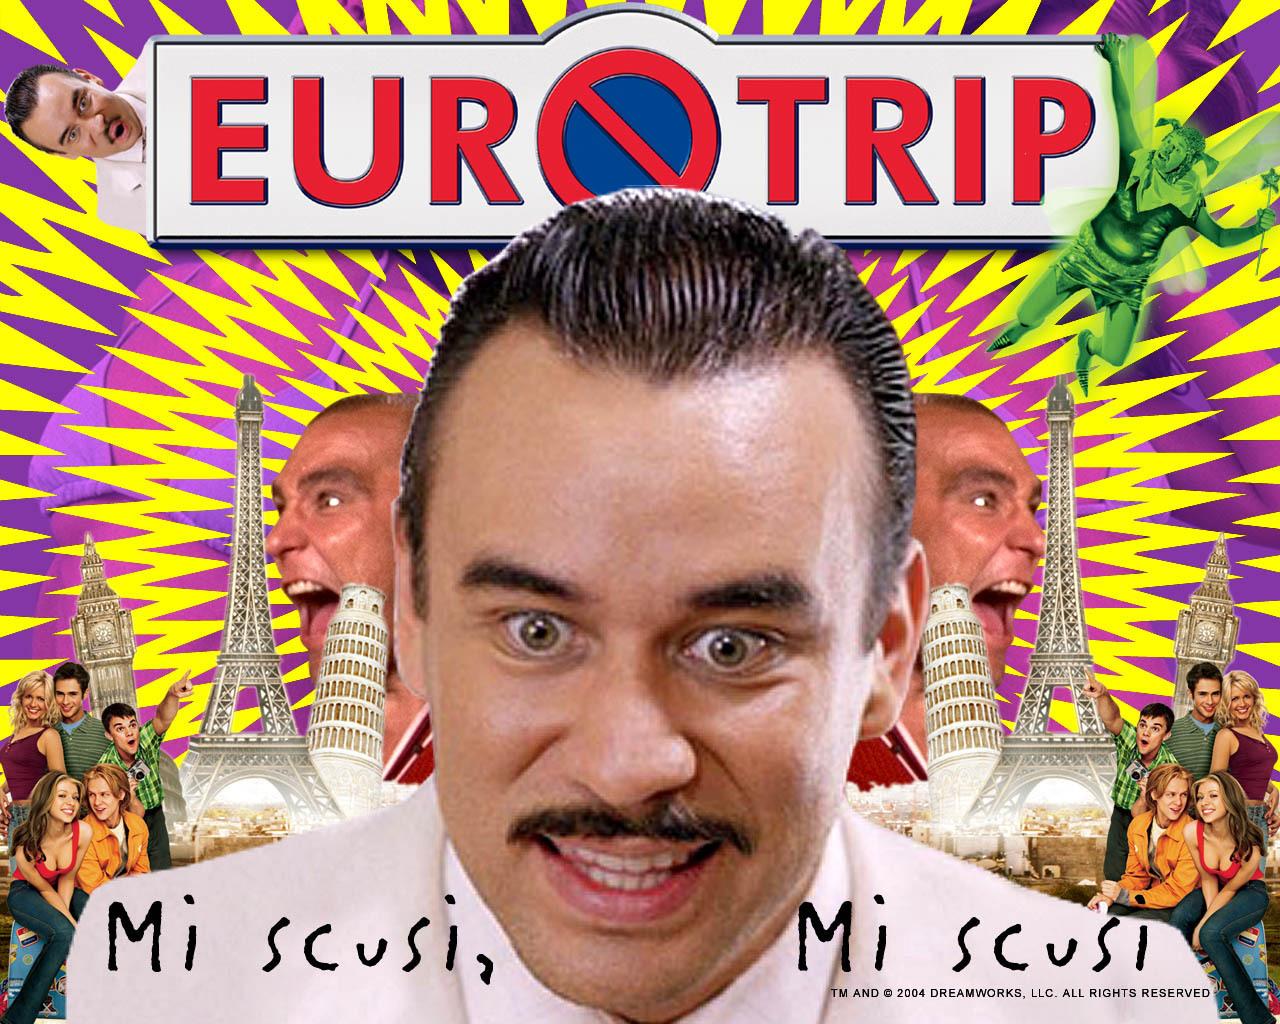 italian trip: